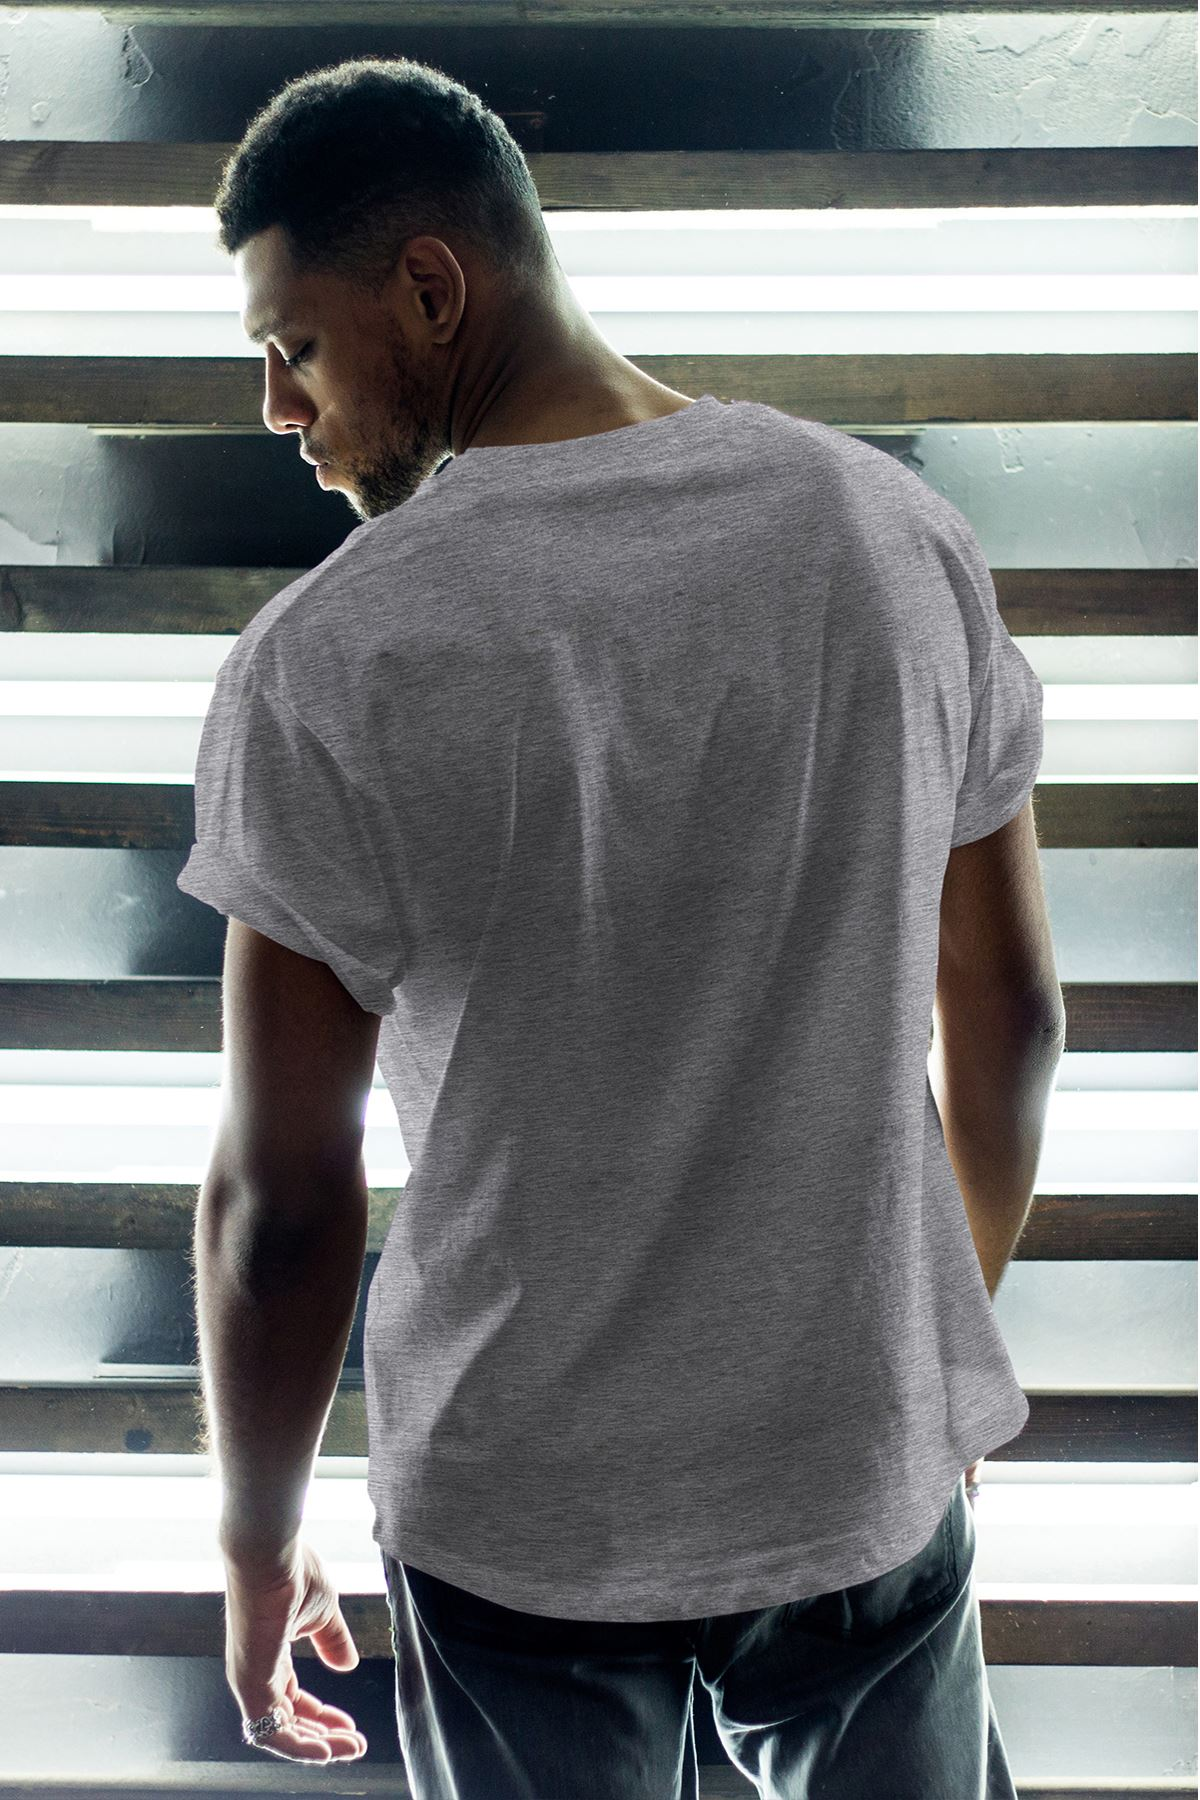 Anime Death Note 03 Gri Erkek Oversize Tshirt - Tişört